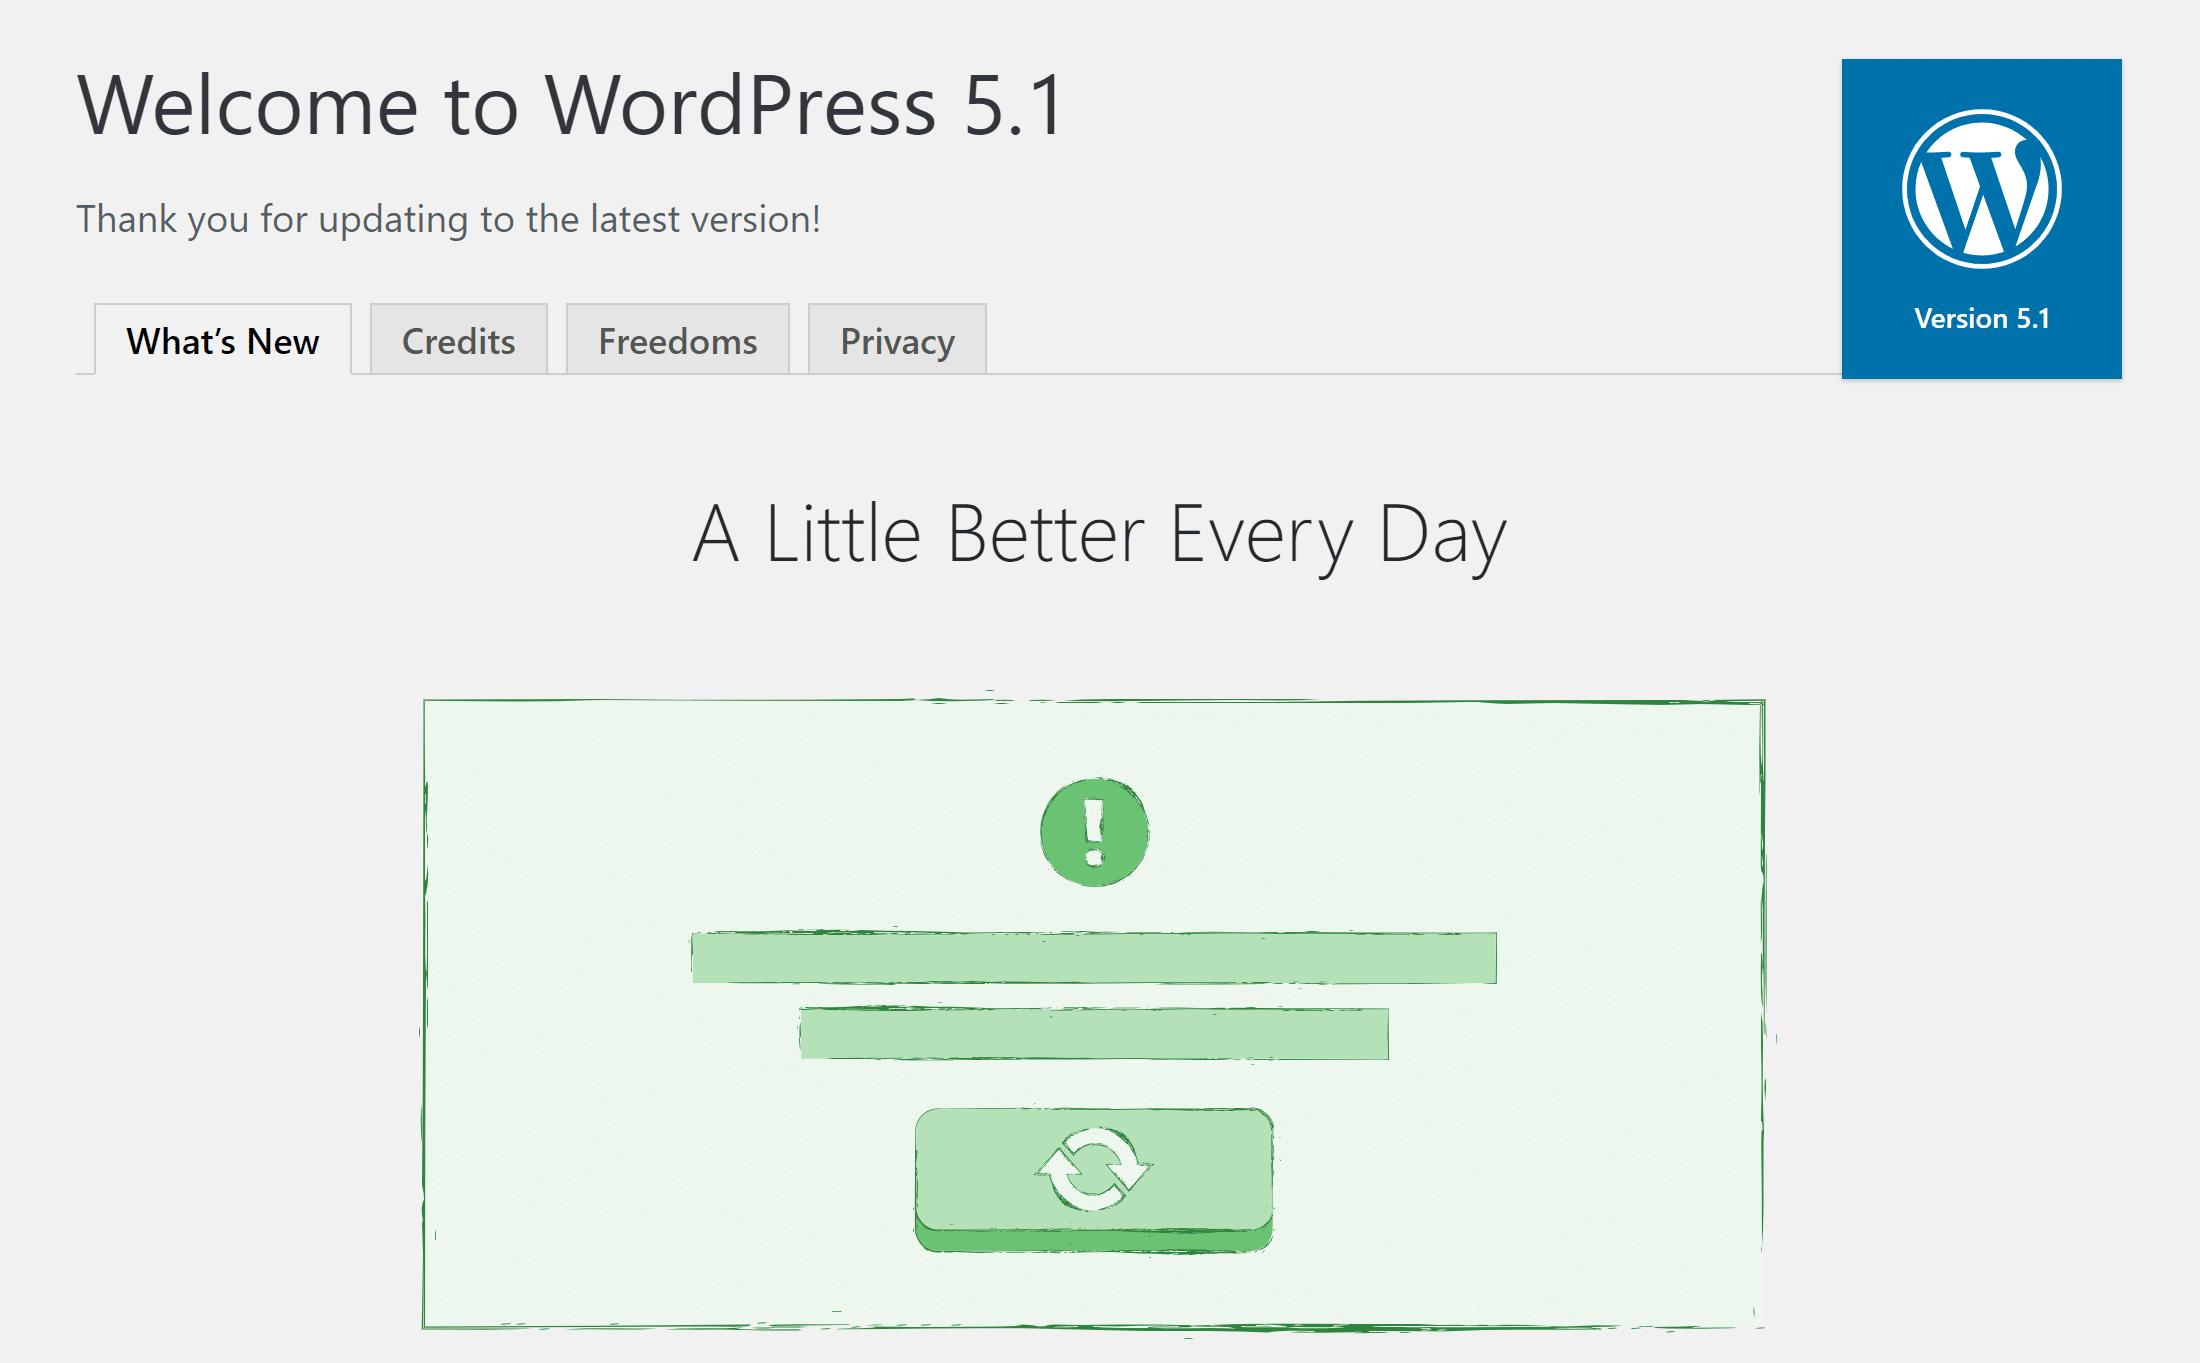 The WordPress 5.1 welcome screen